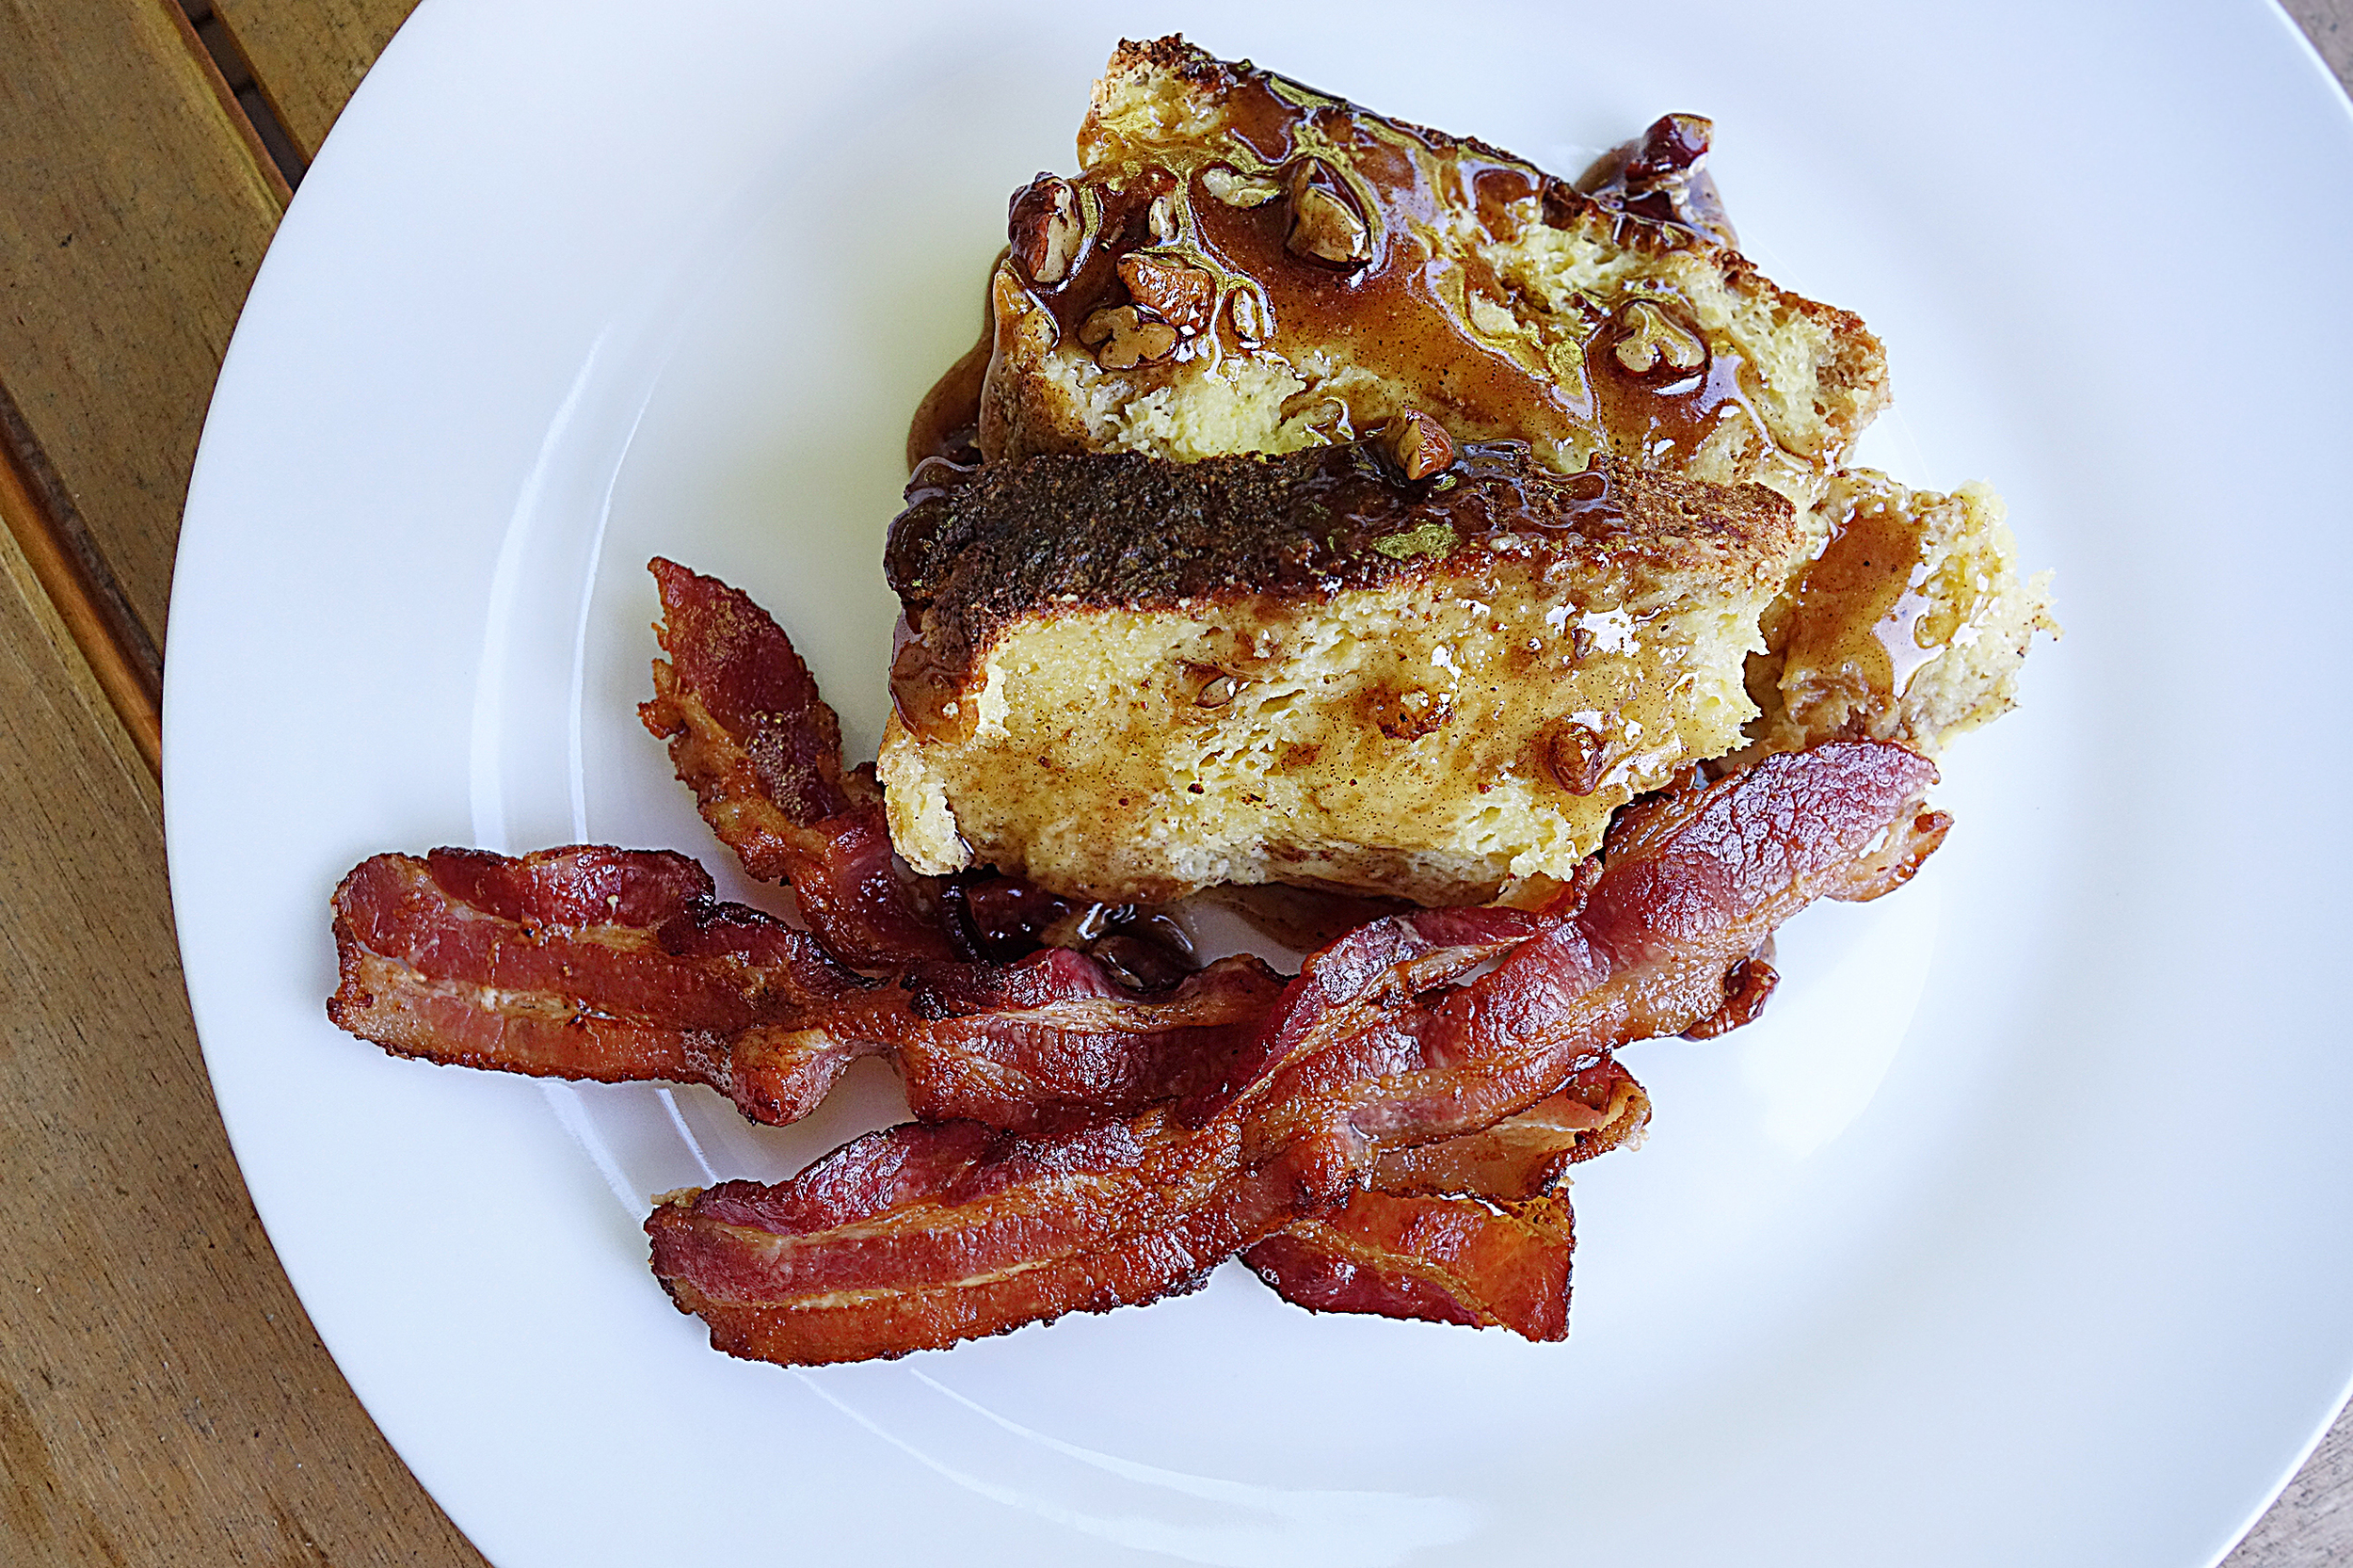 Bacon, you're a star!